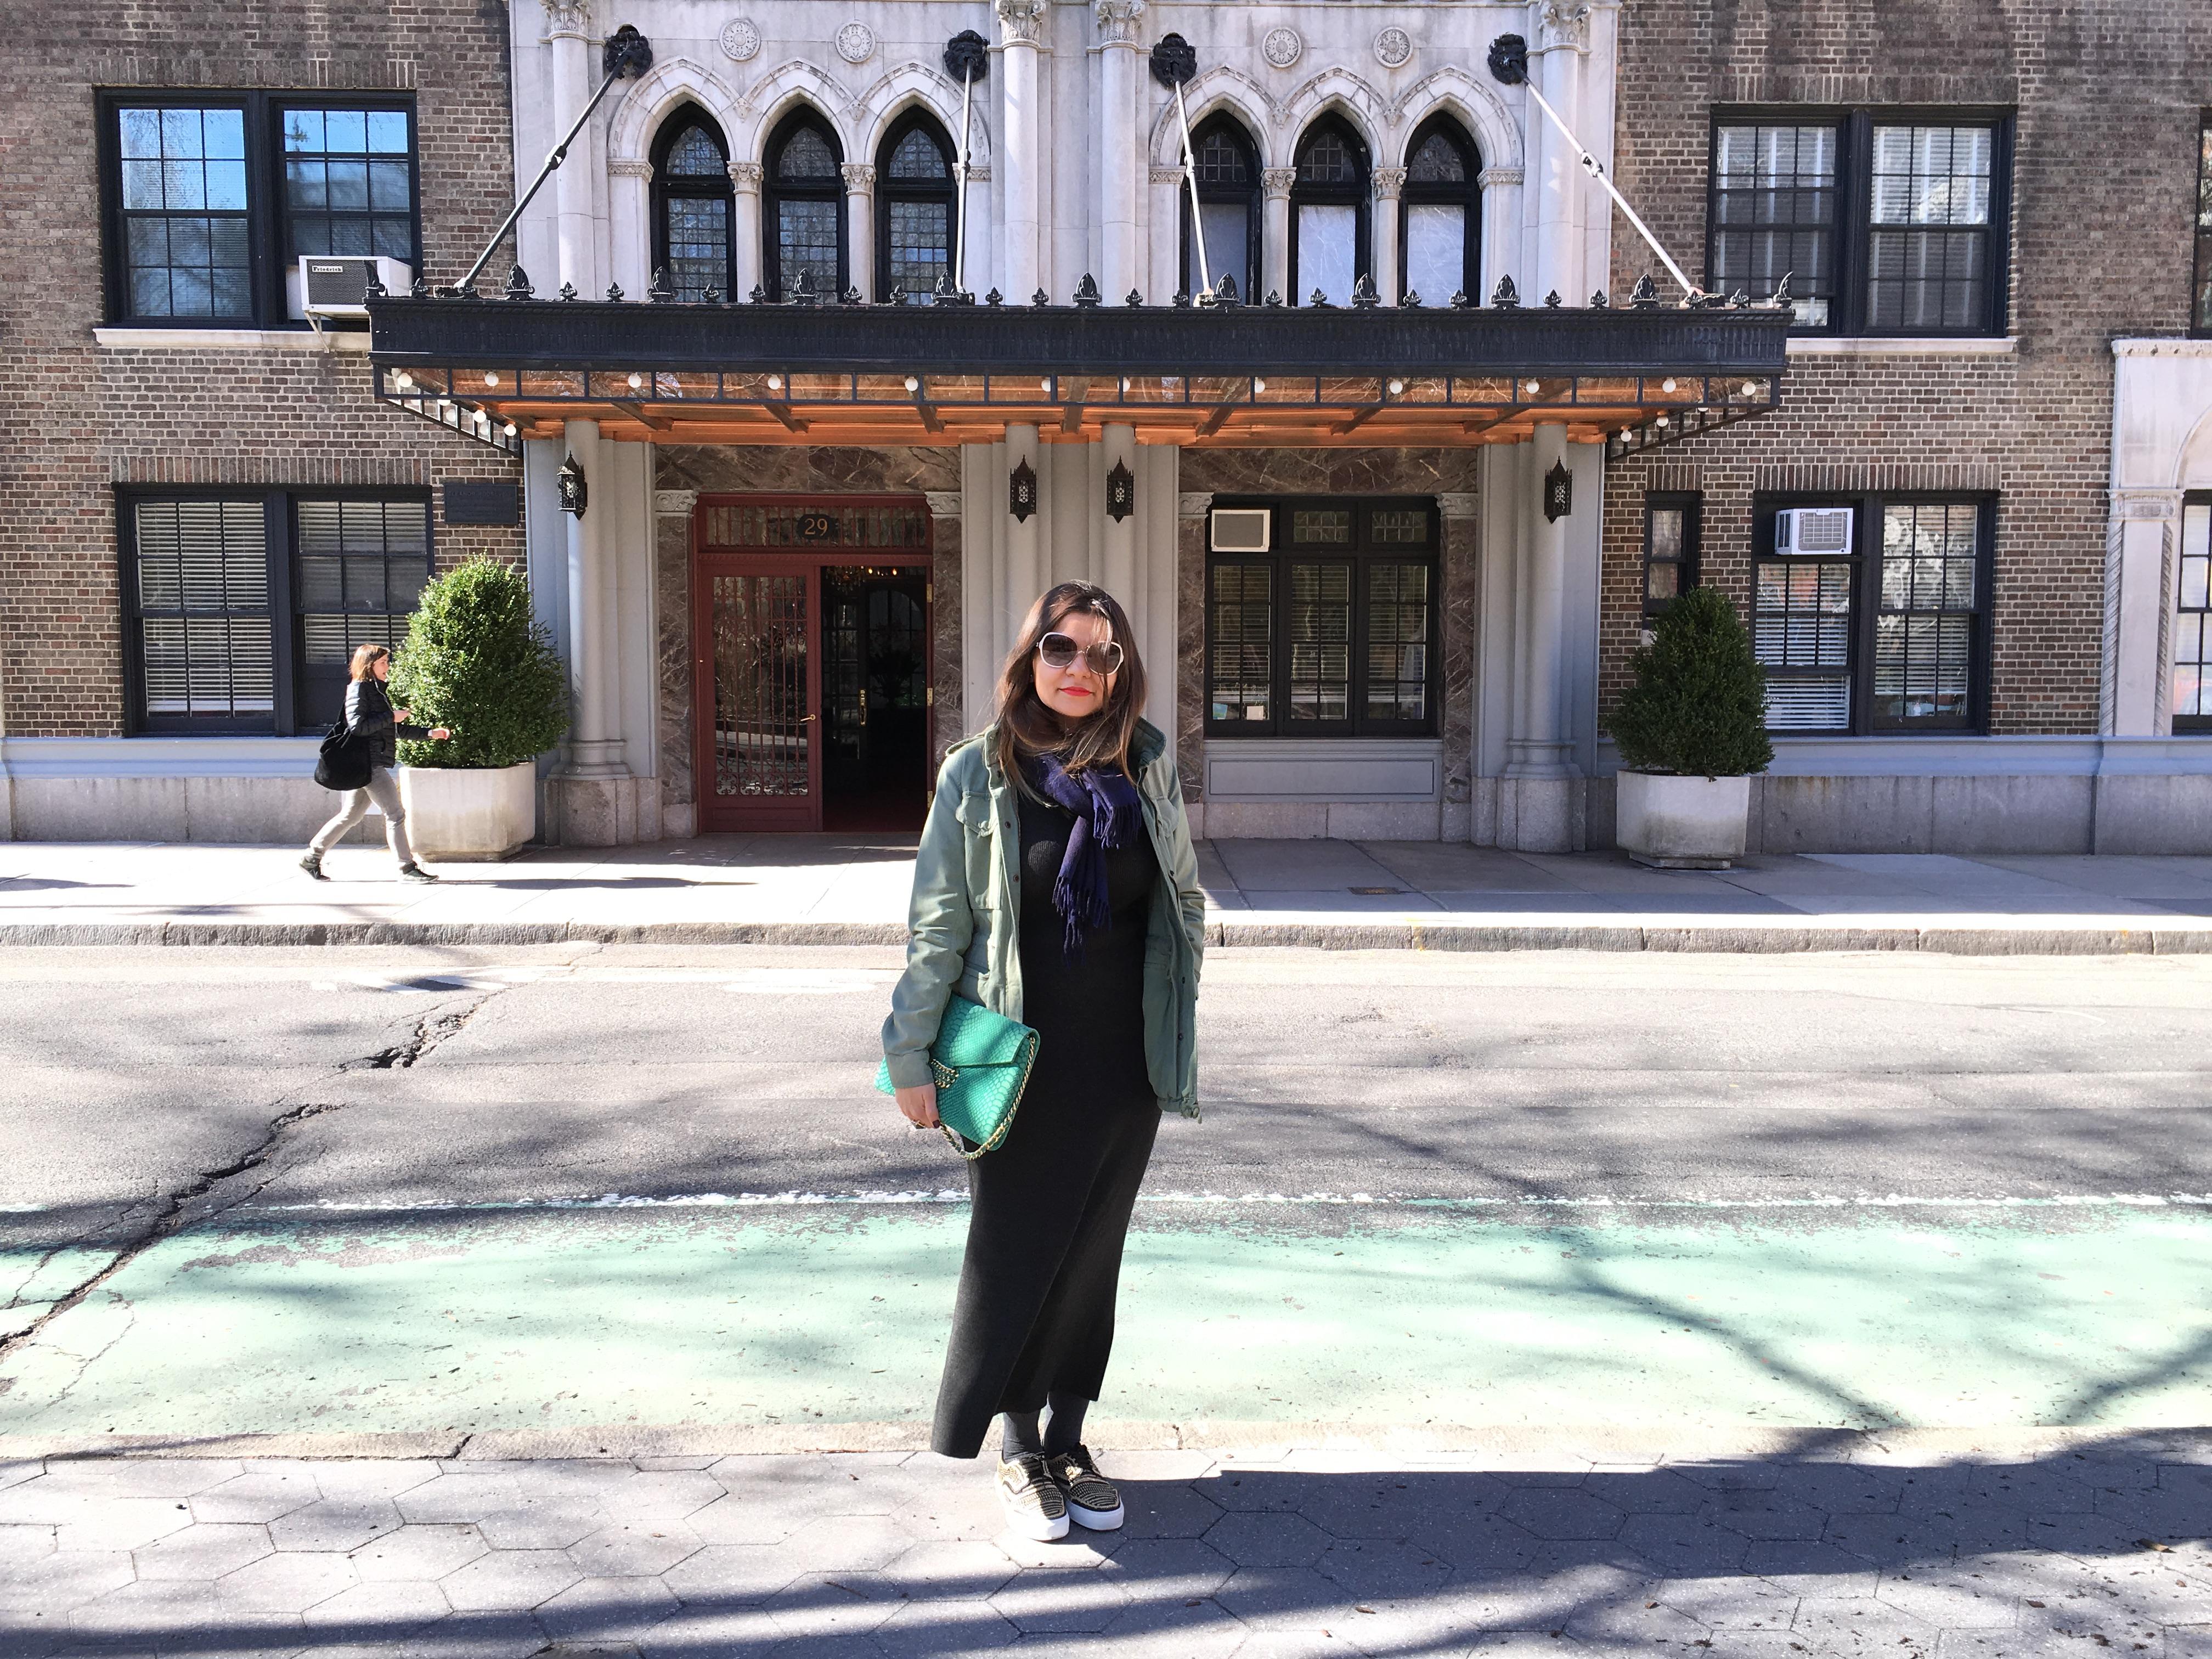 casul_chic_dress_looks_alley_girl_new_york_fashion_blog12